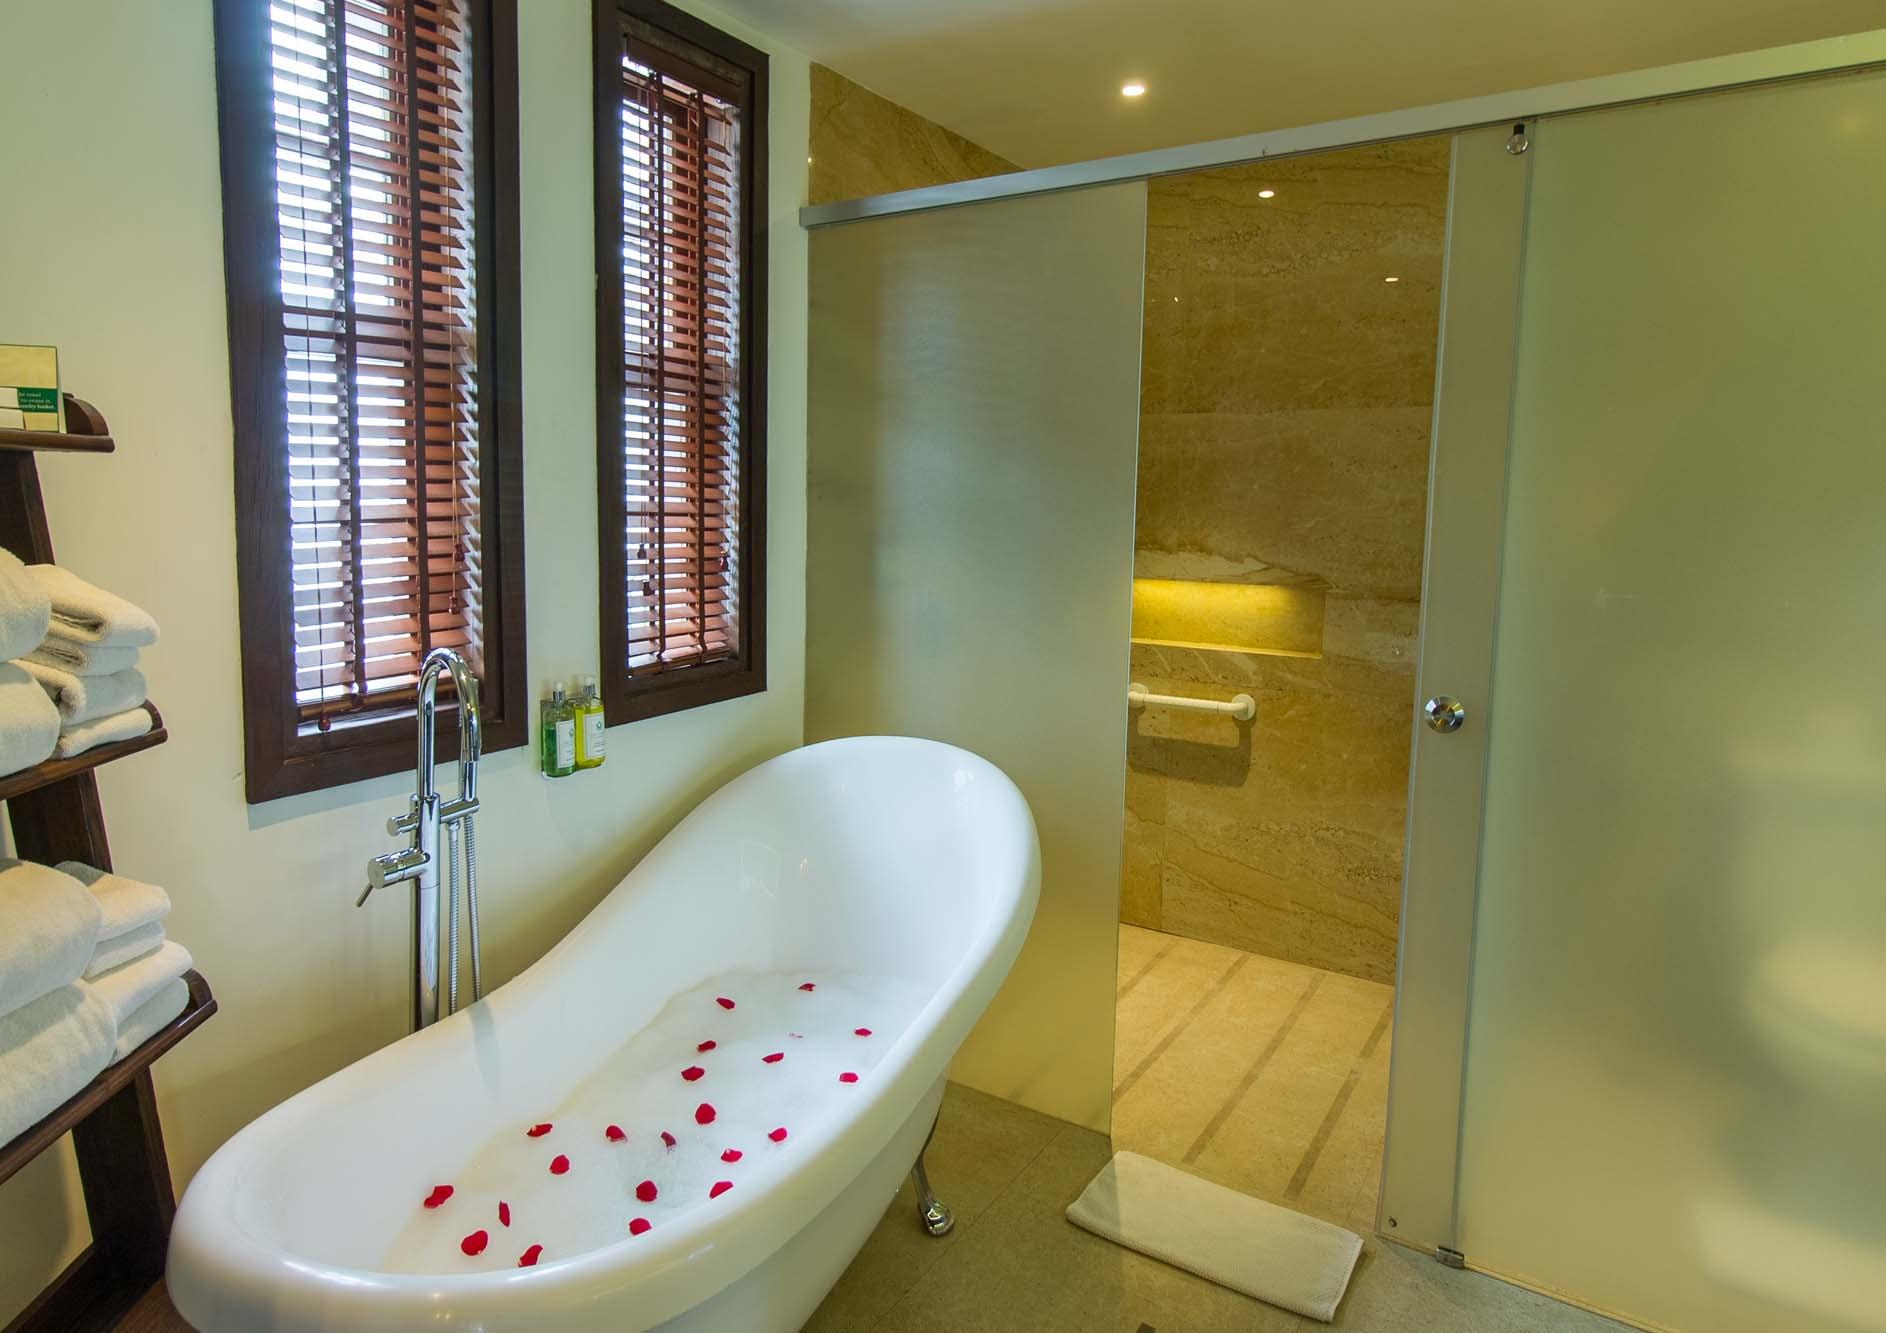 luxury-bathtub-with-rose-pattles